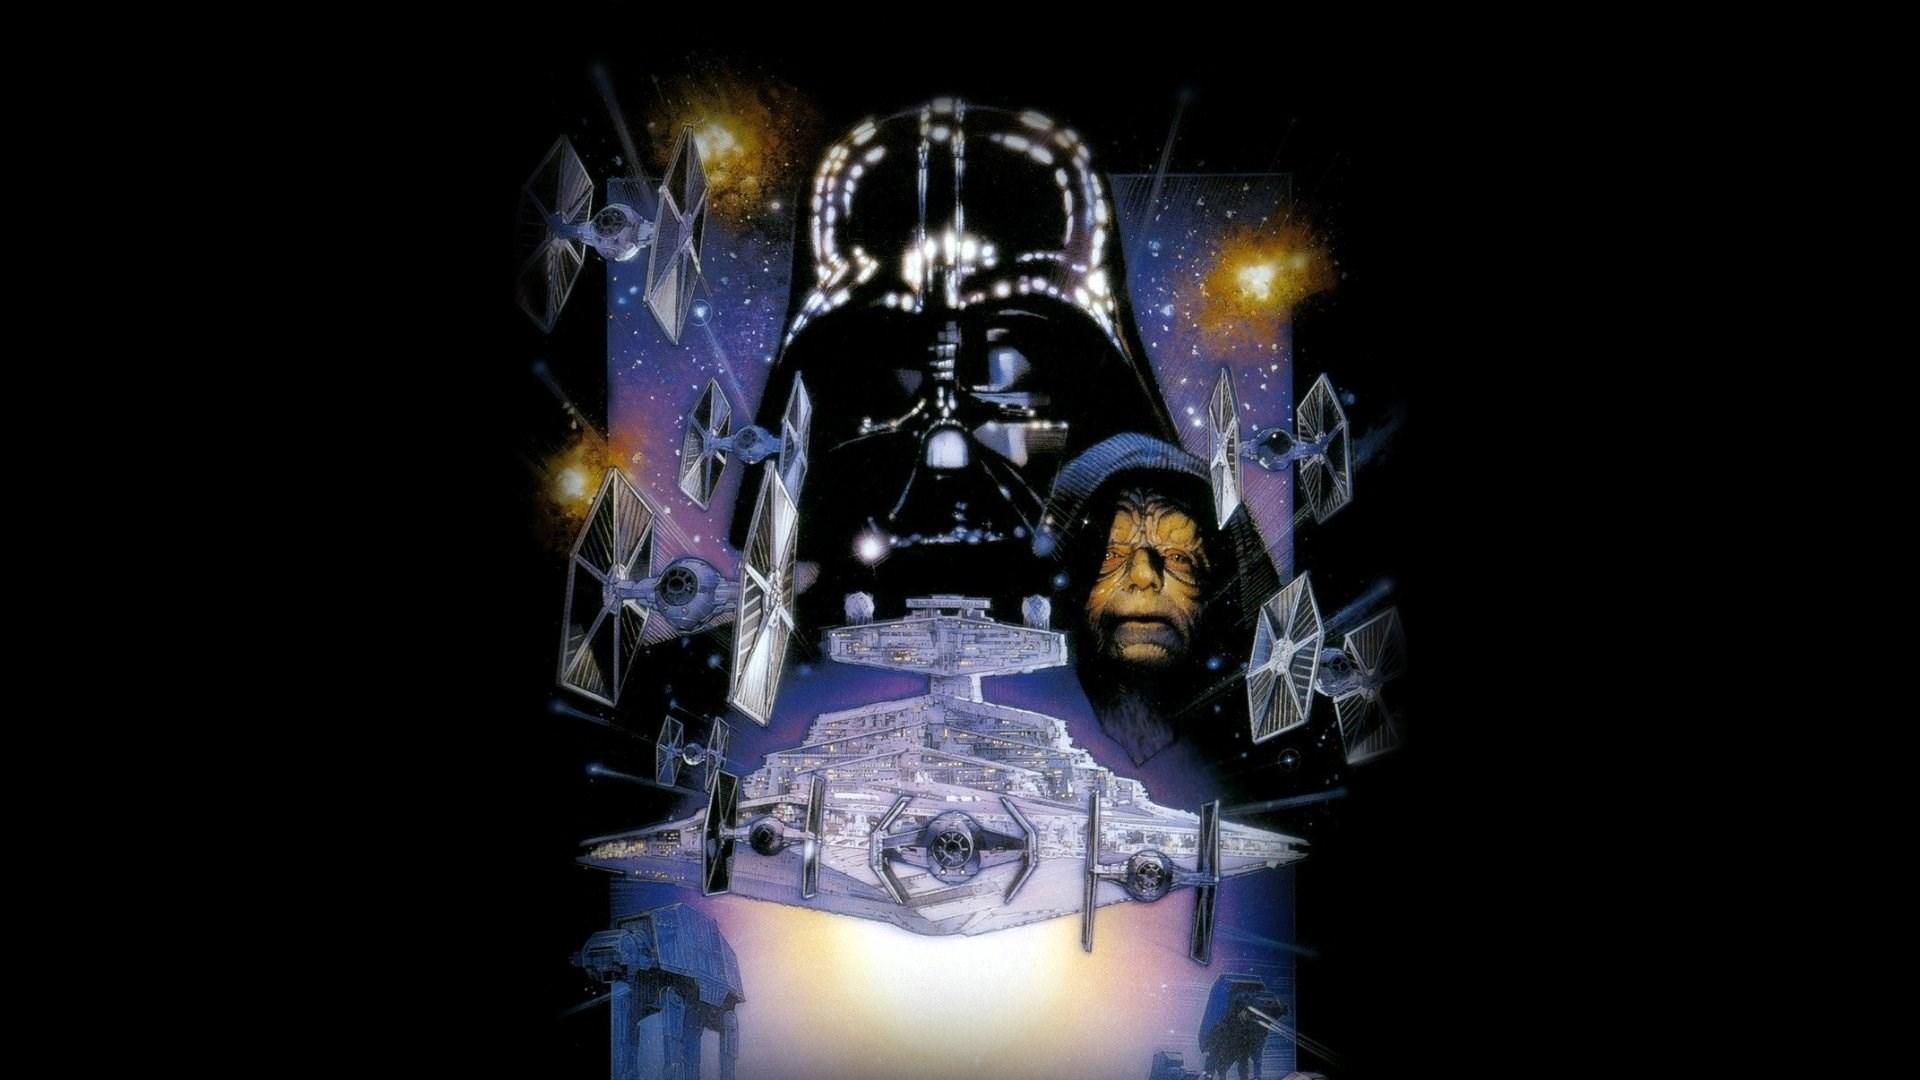 Free Download Star Wars Episode V The Empire Strikes Back